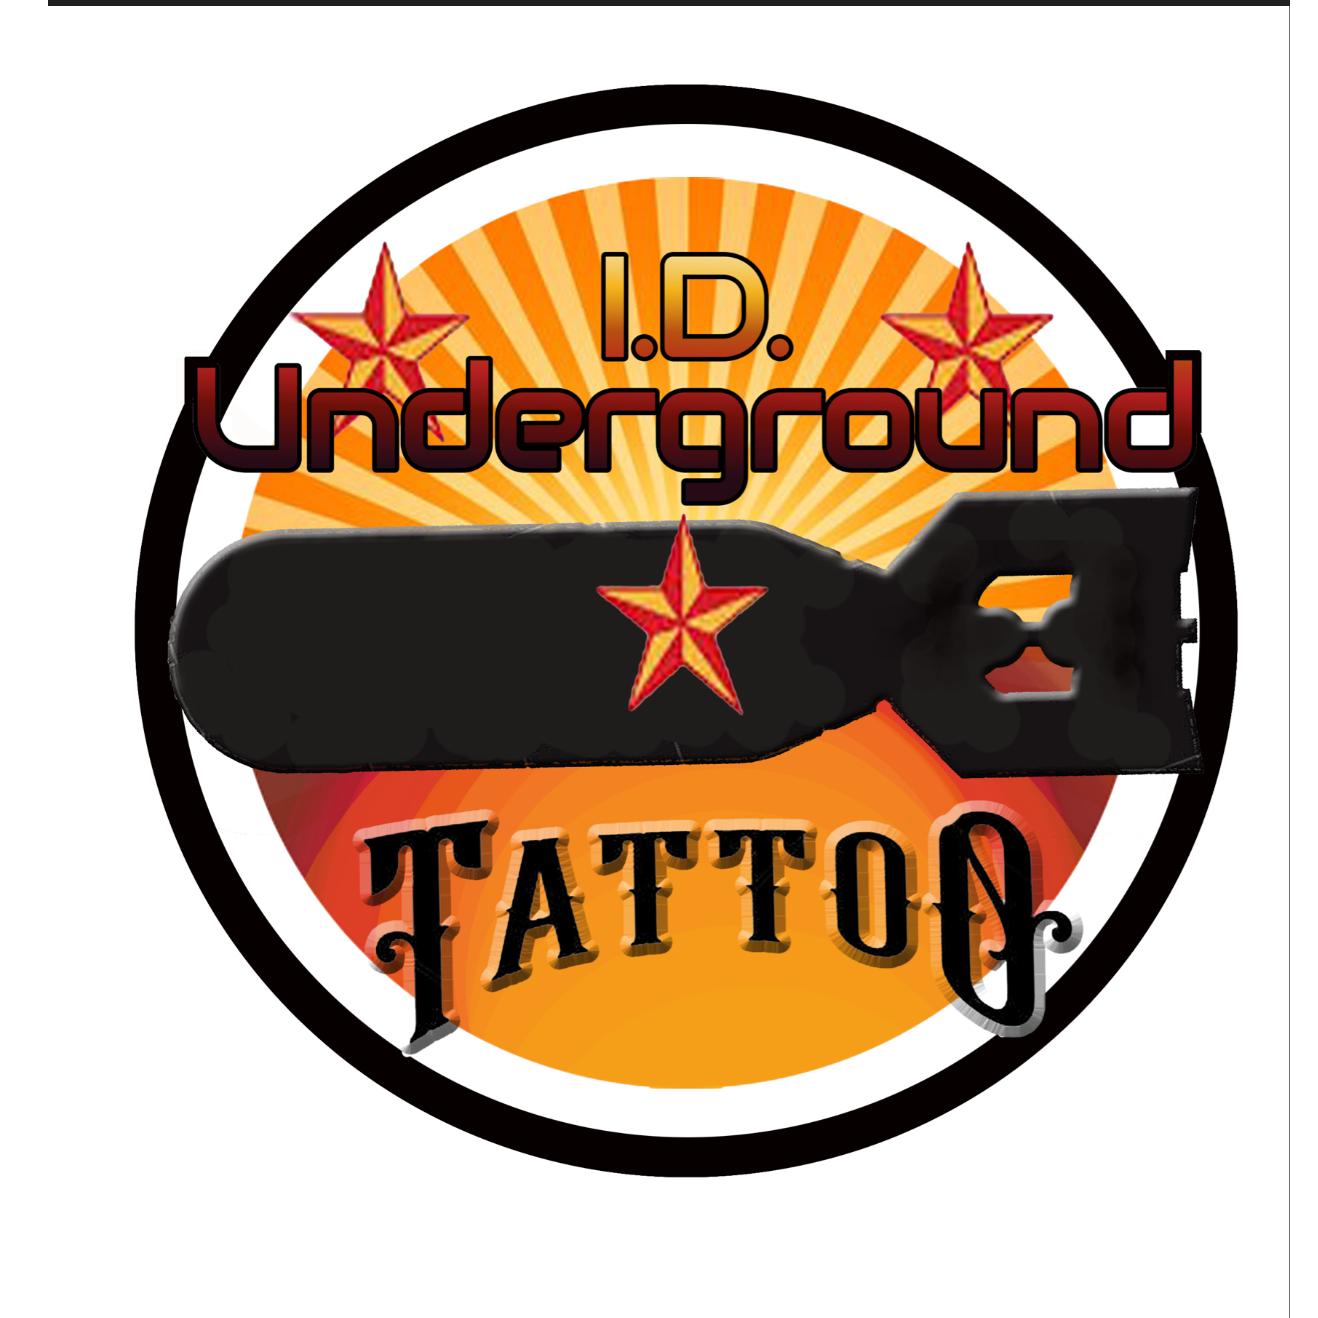 I.D. Underground Tattoo